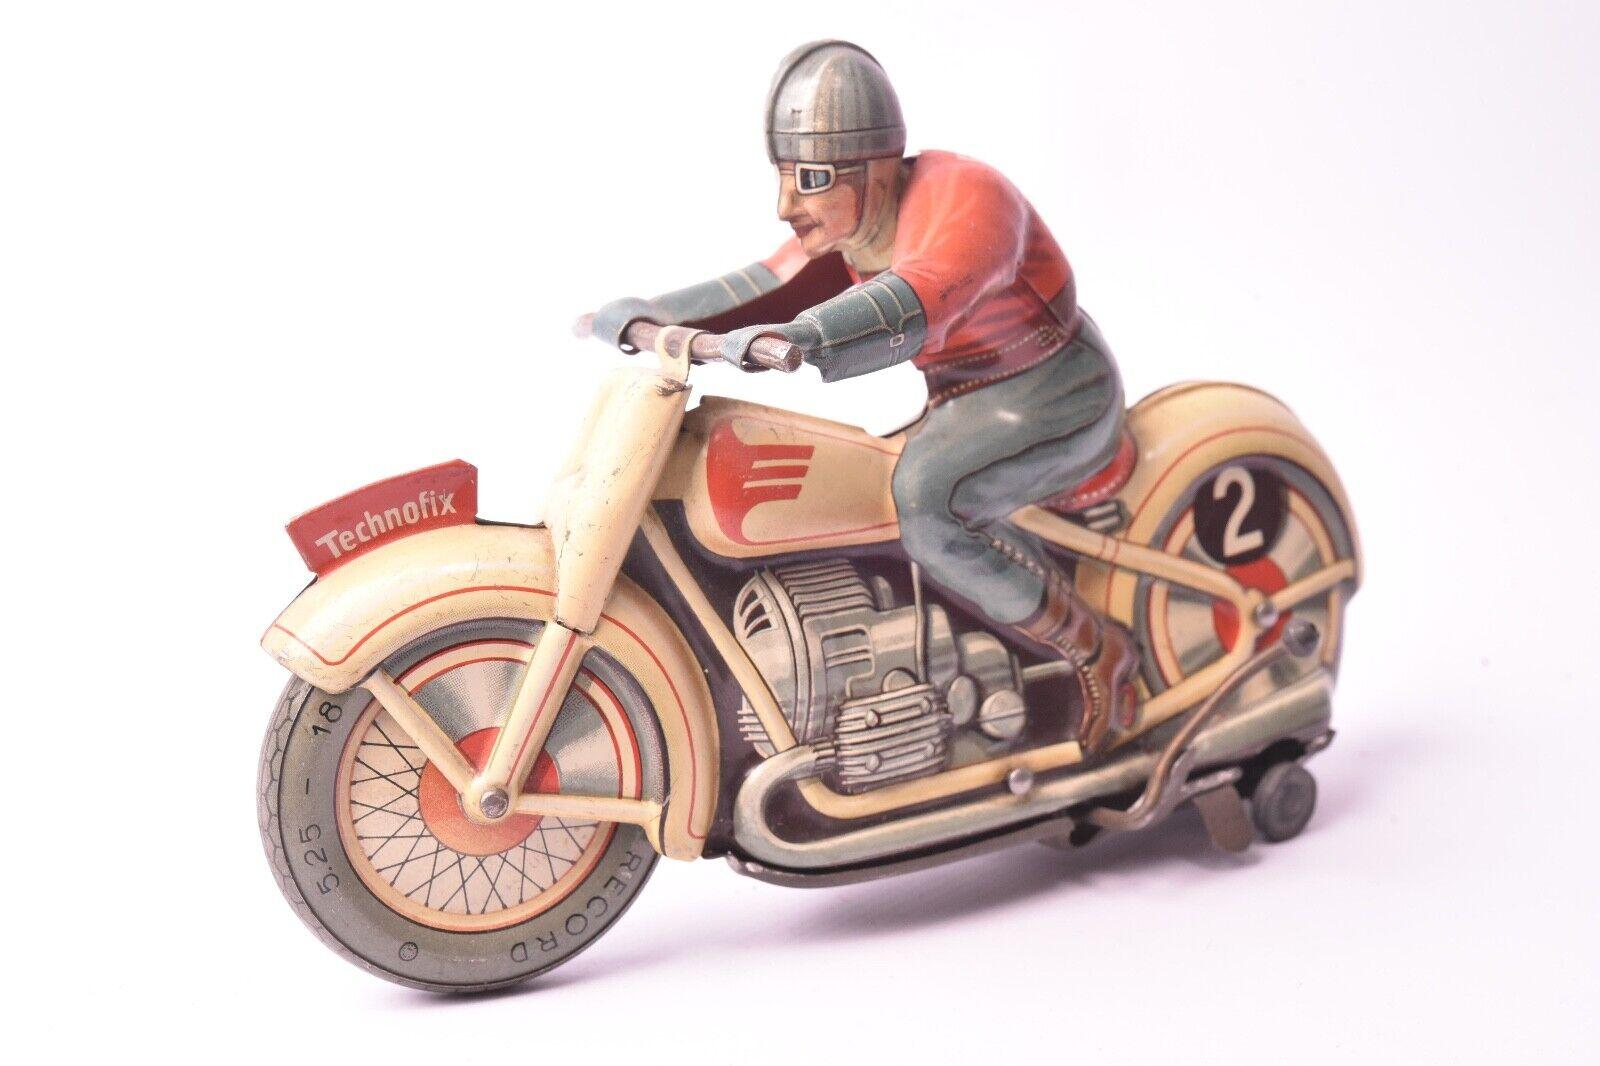 Juguete Ancien. Moto Technofix Alemania, 1945 US Zona , Chapa de Metal